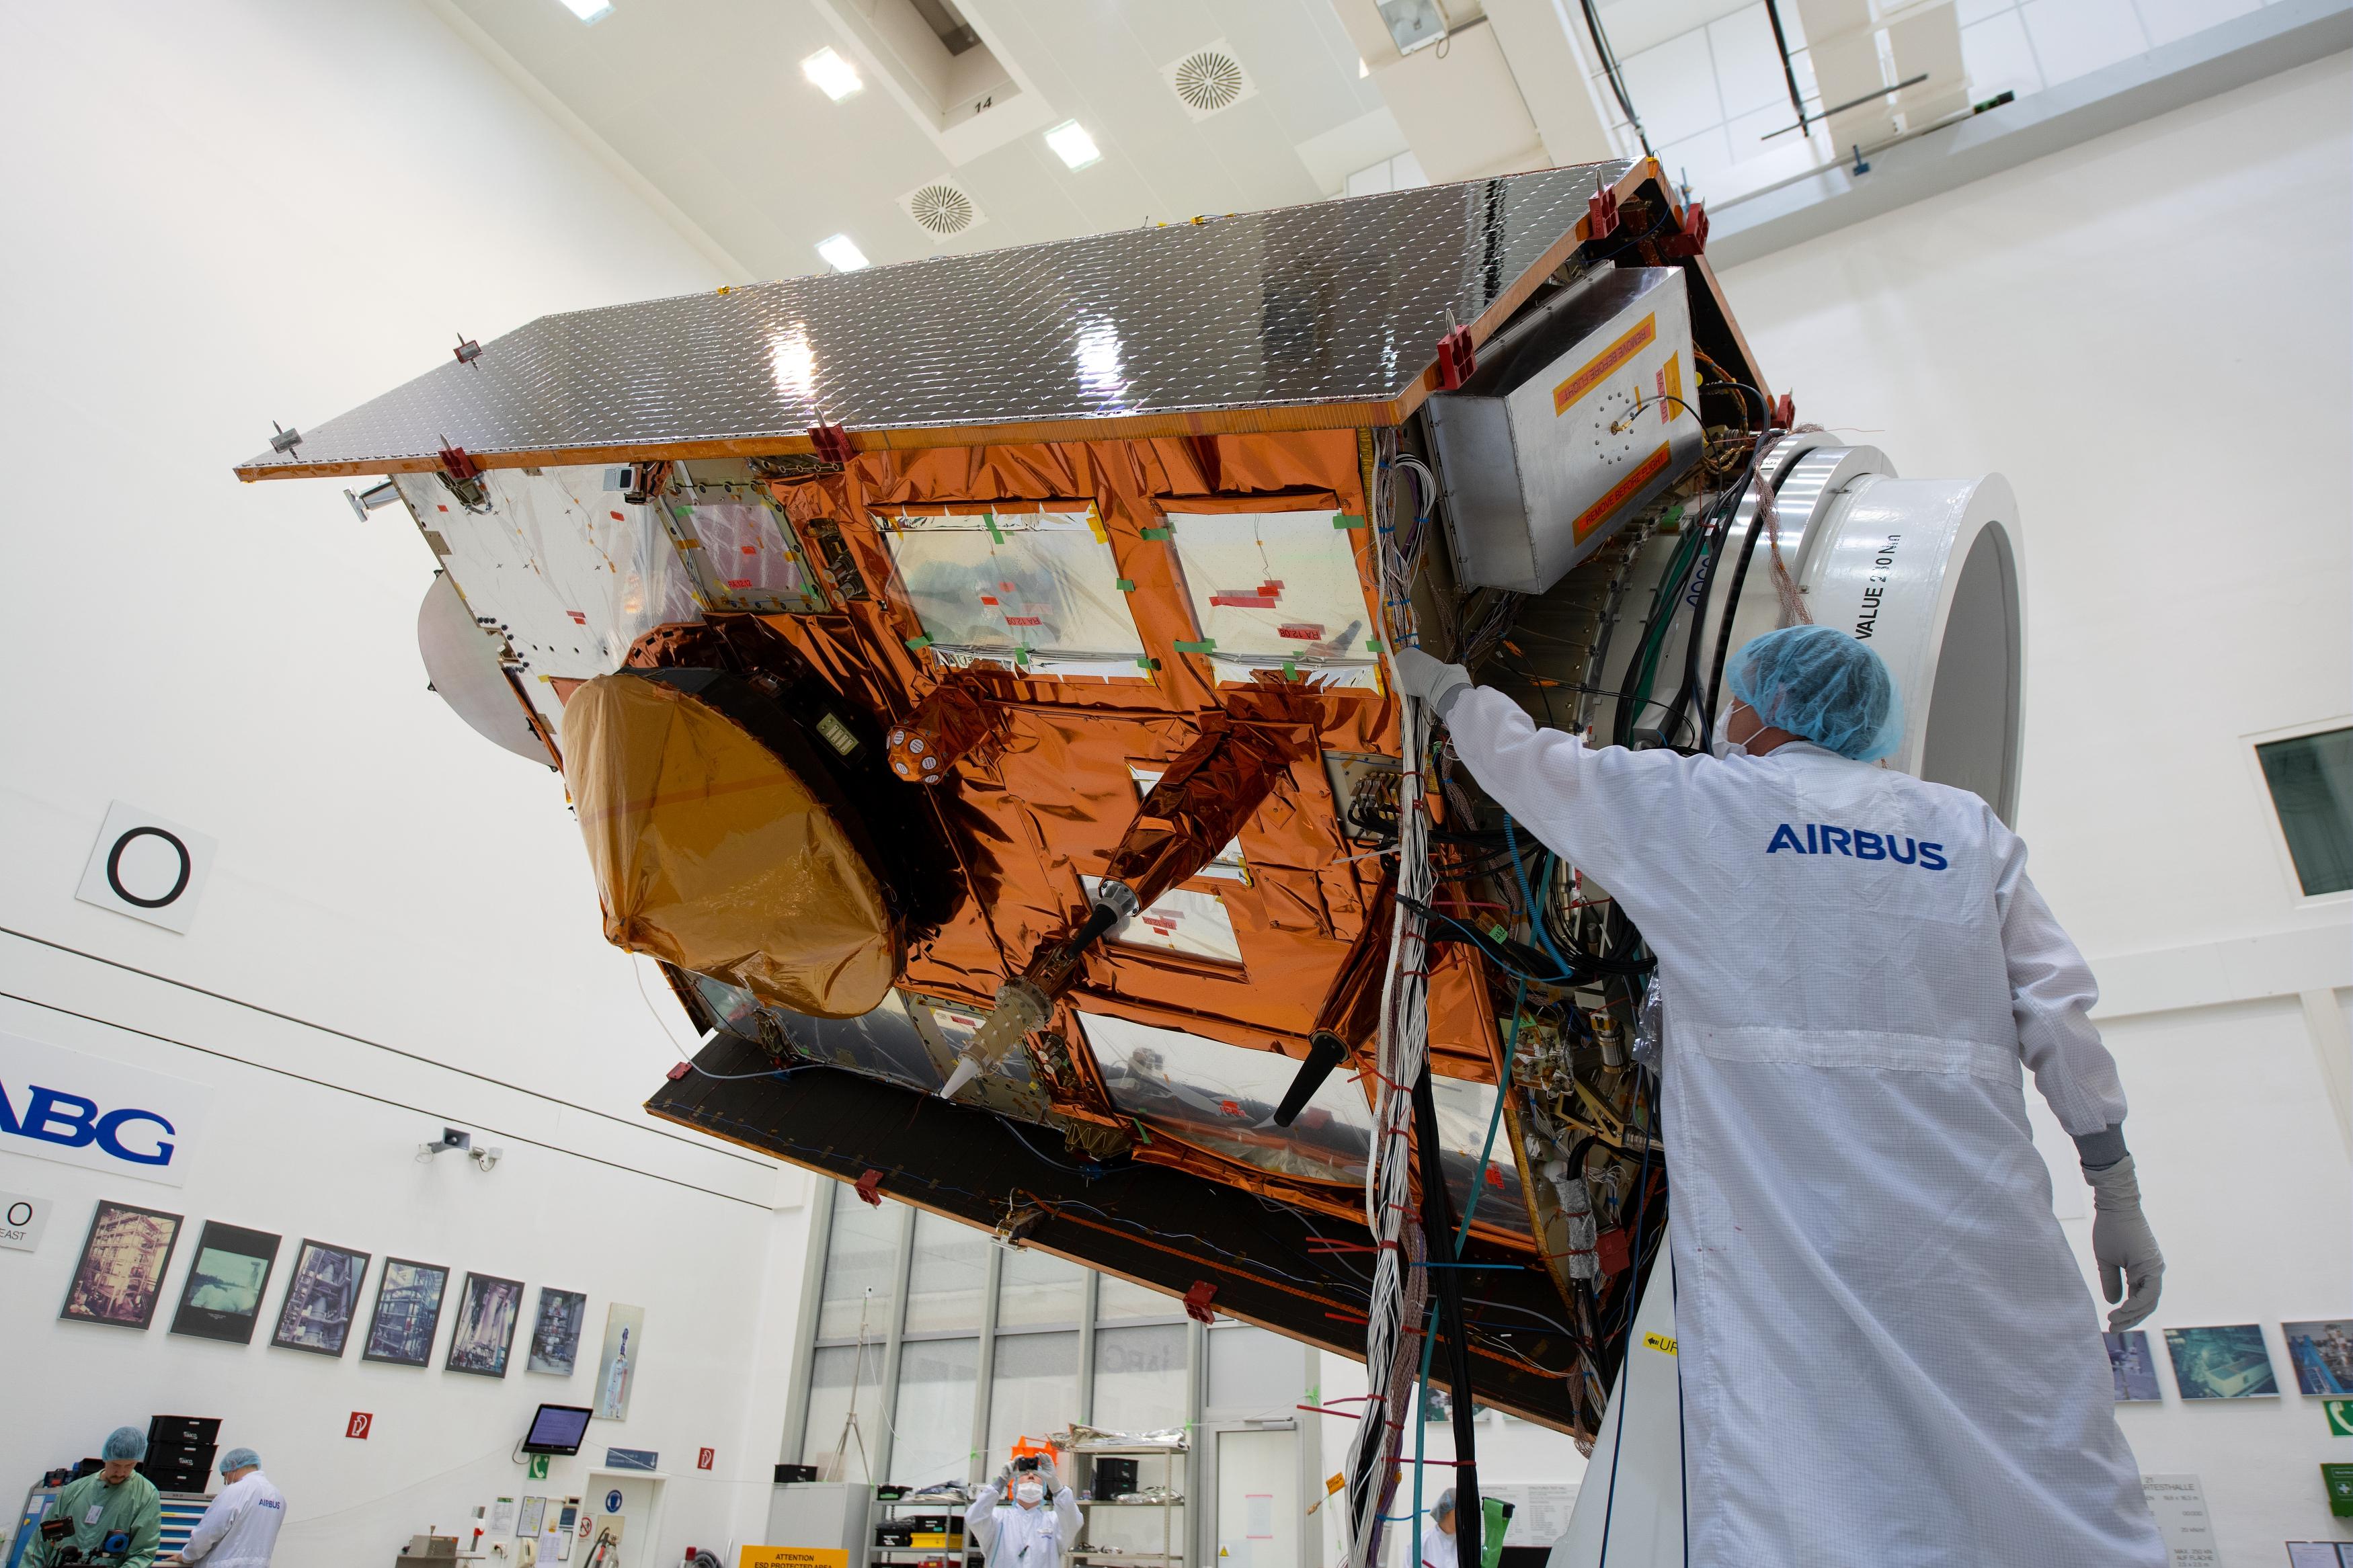 Sentinel 6 under bygging i Tyskland. Satellitten vil måle havnivå, topografien under havene, vind og bølgehøyder. Foto: ESA.